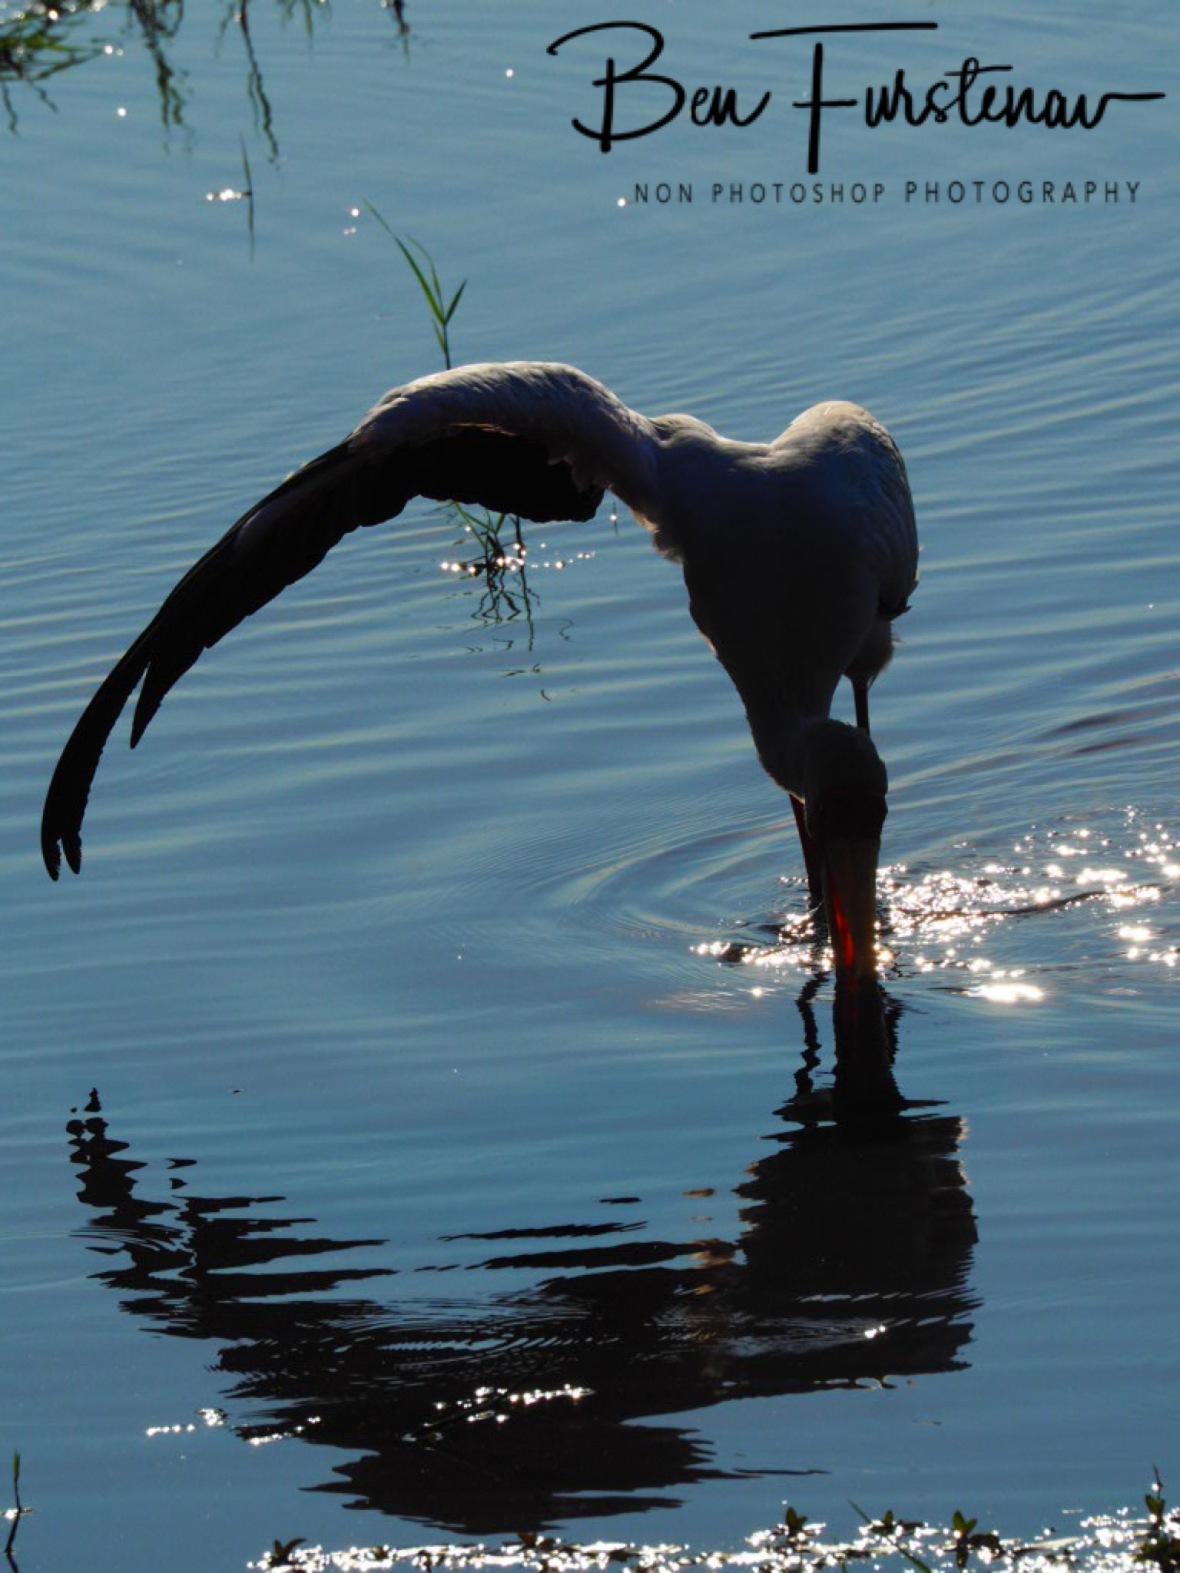 Casting a shadow, Chobe National Park, Botswana